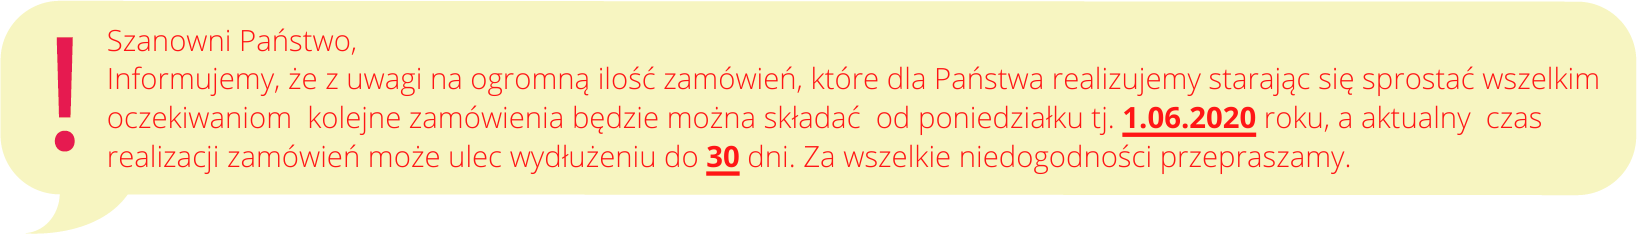 baneer.png